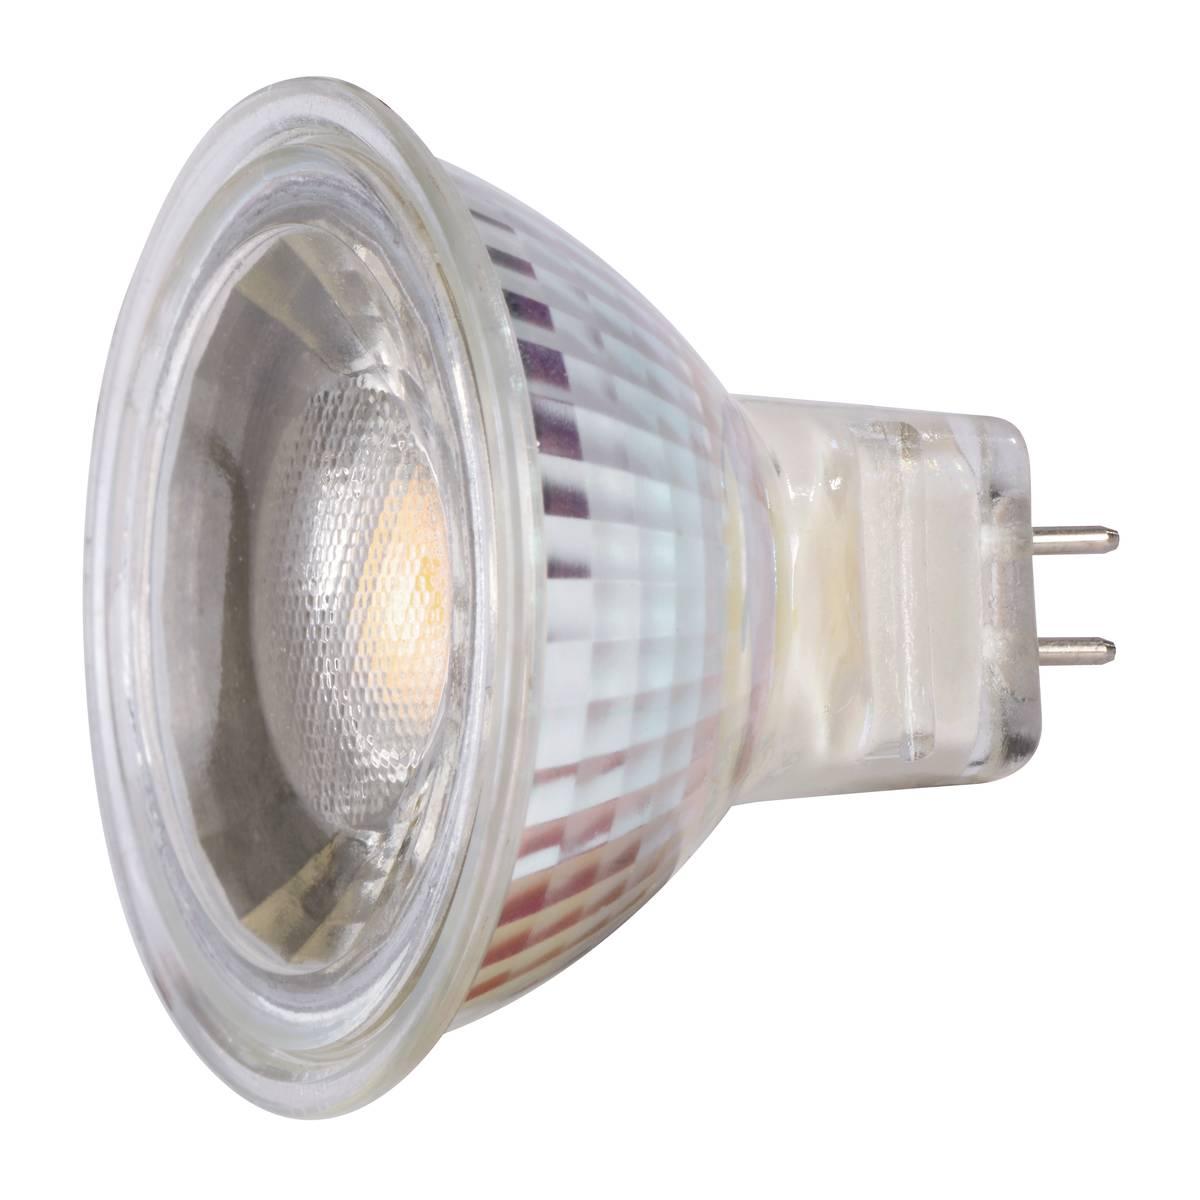 SLV LED MR16 5W 38° 2700K